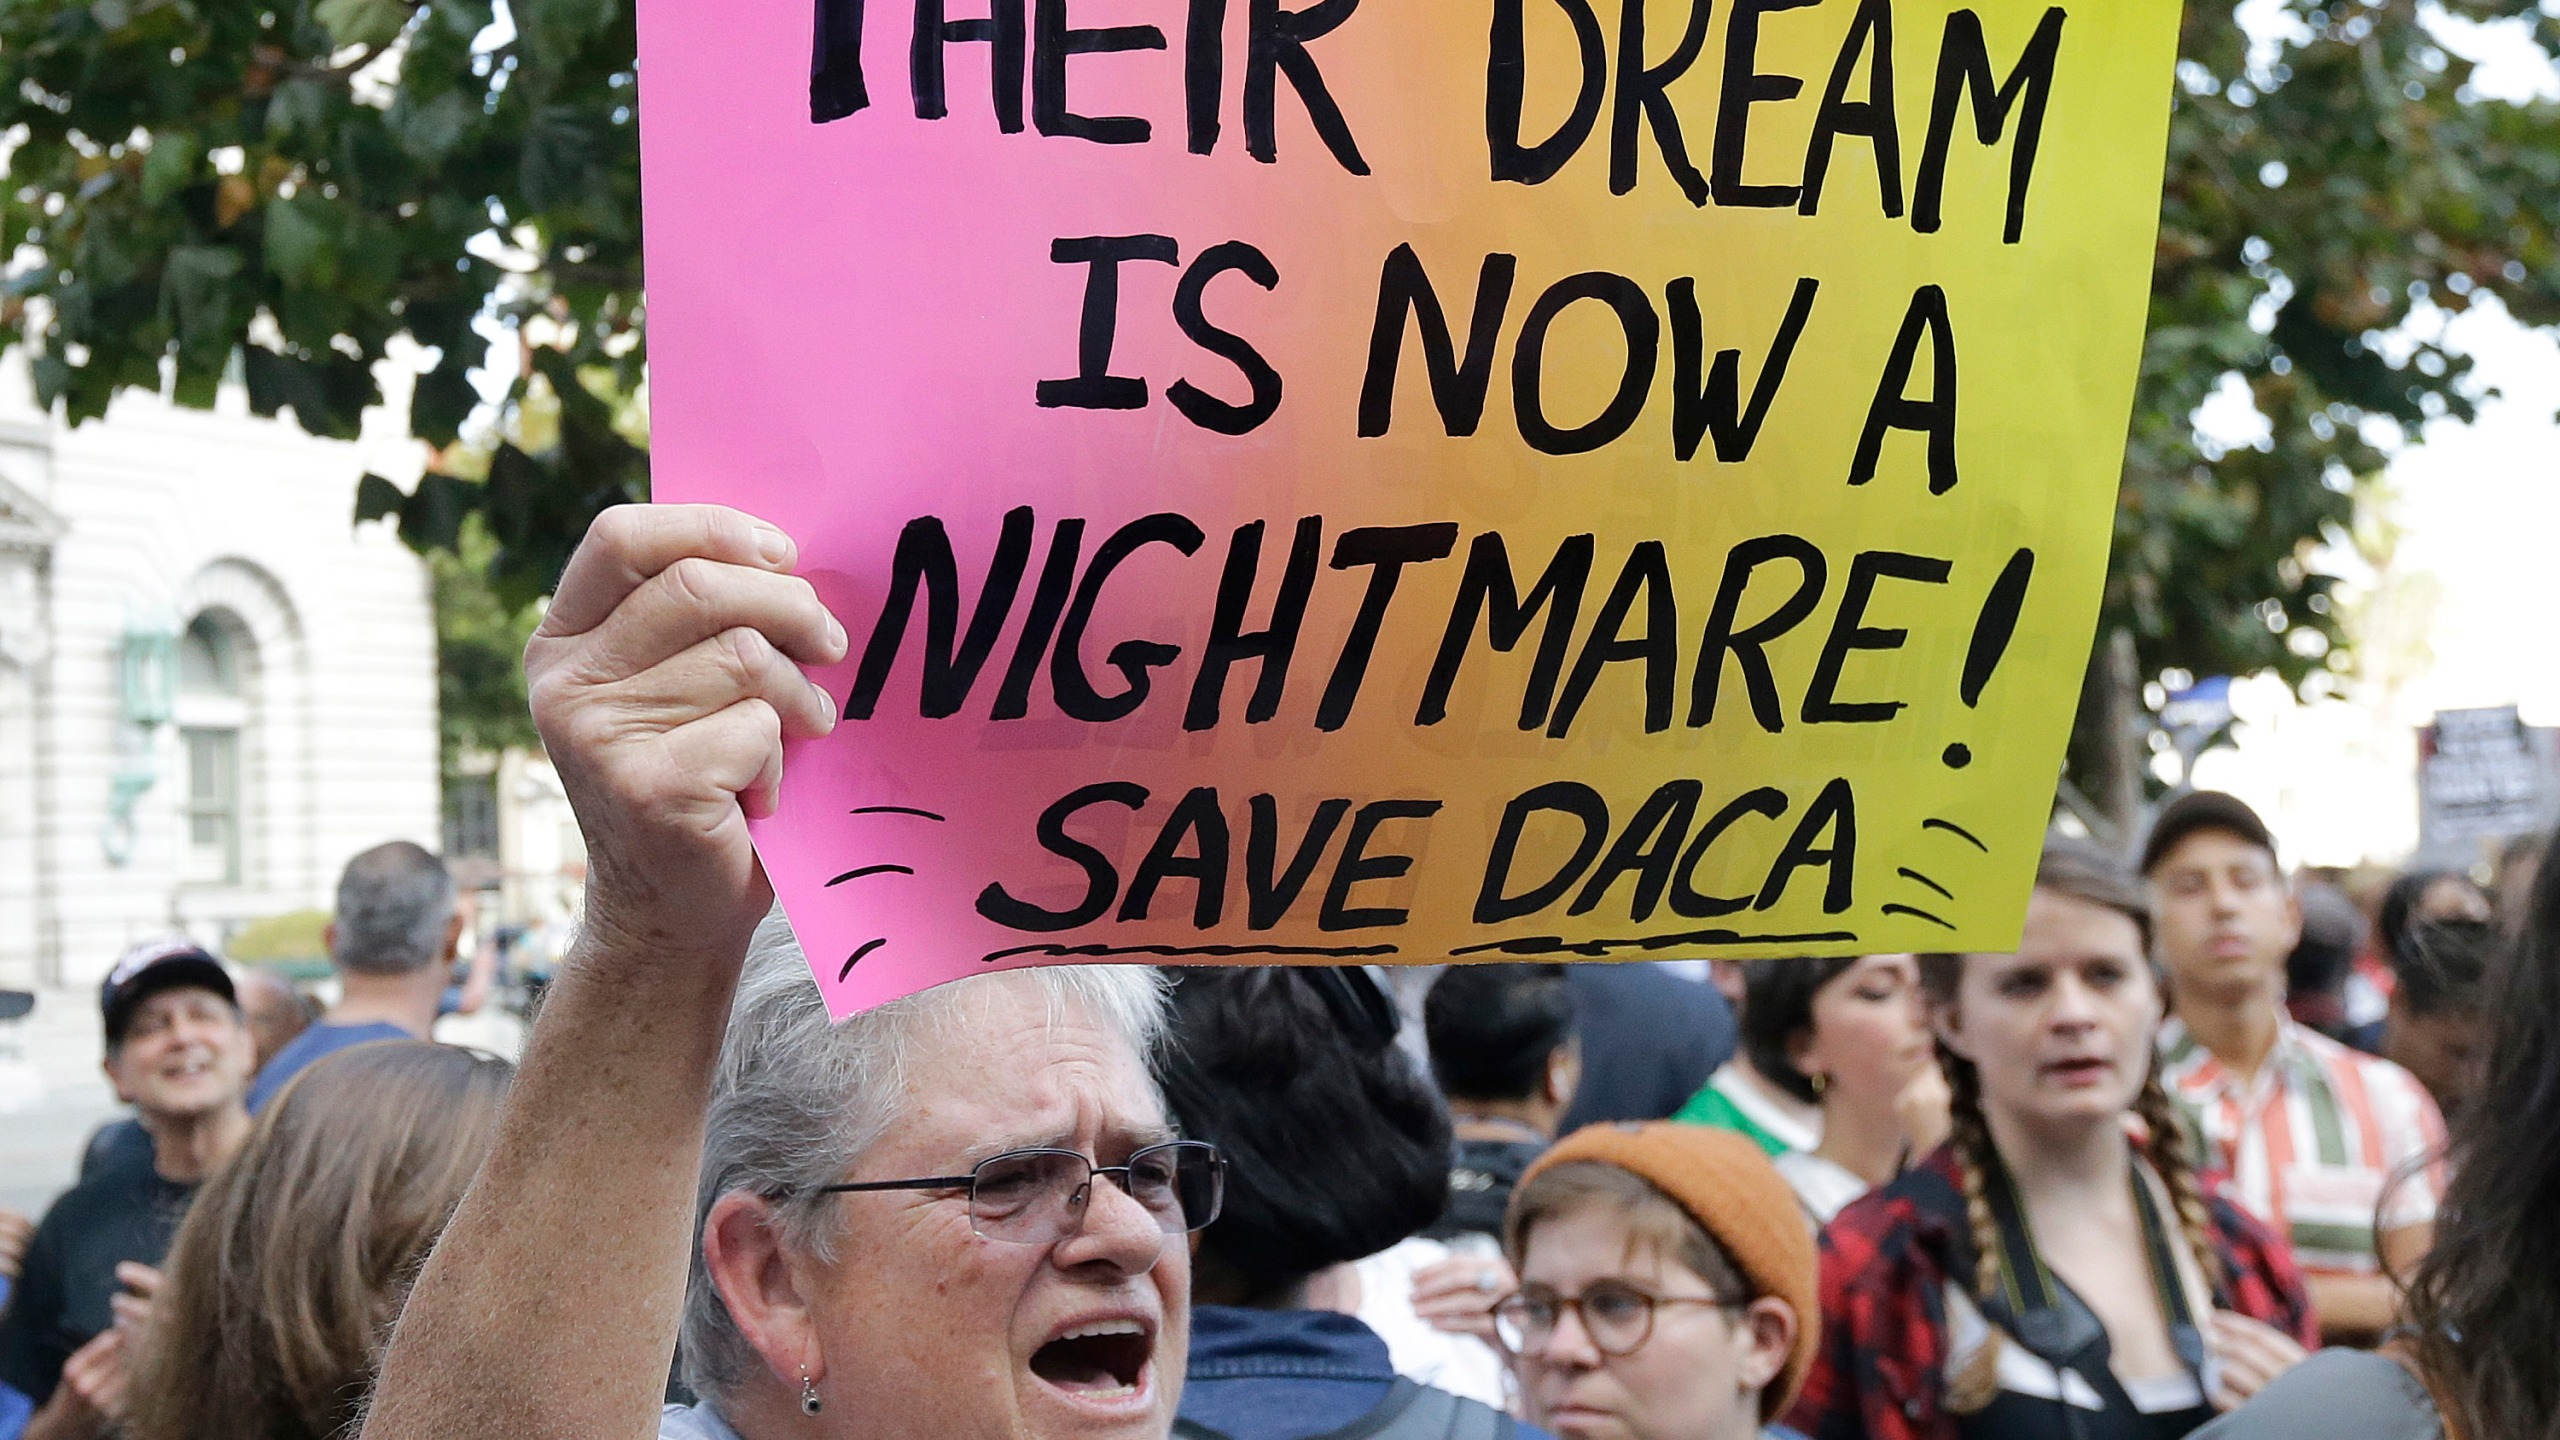 Trump_Immigration_Legal_Challenge_74325-159532.jpg26082888